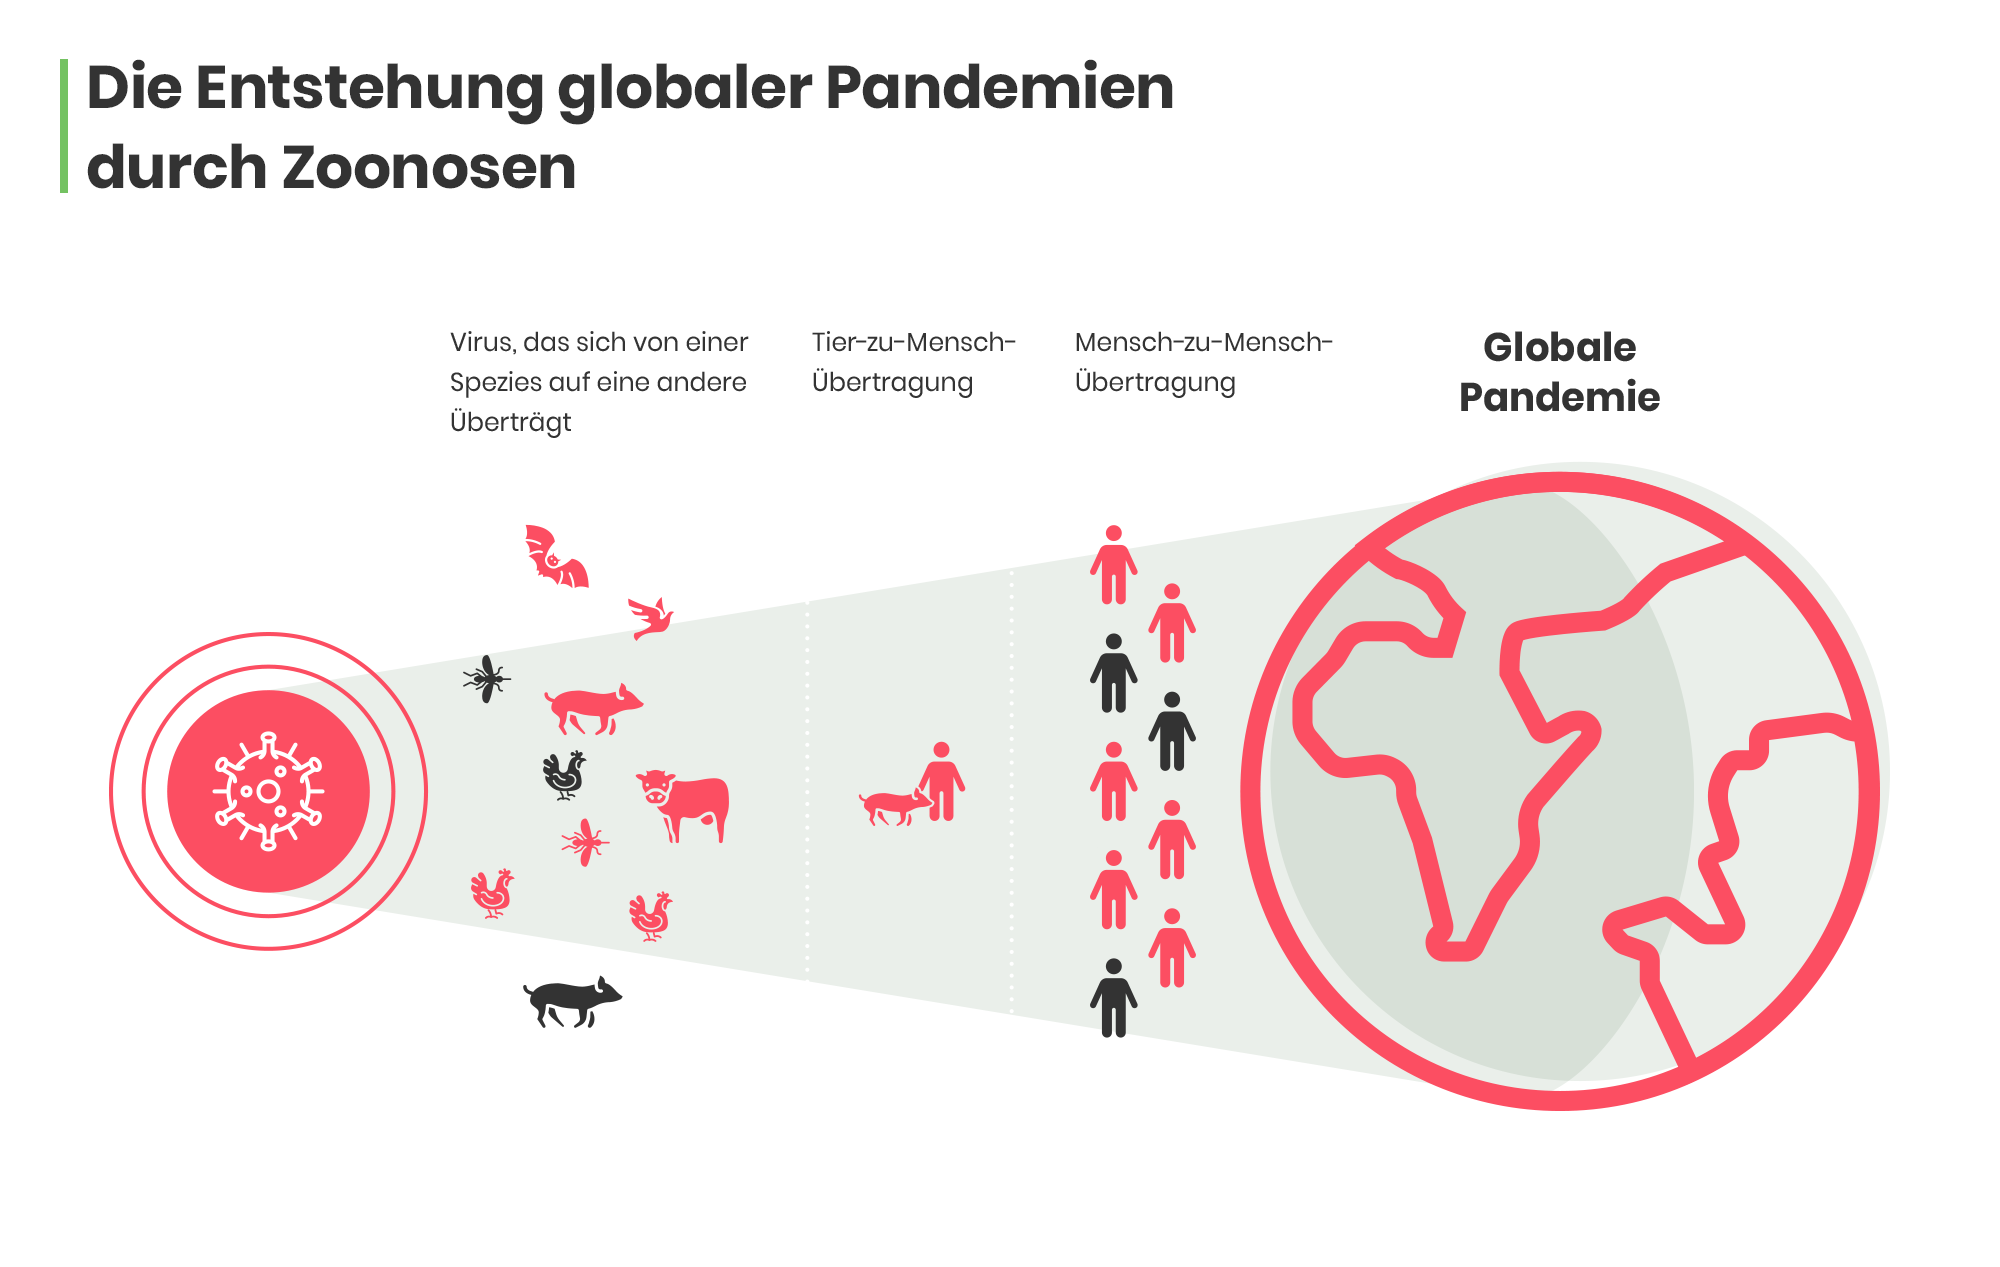 00-Entstehung-Pandemie_ohne-Quellenangabe